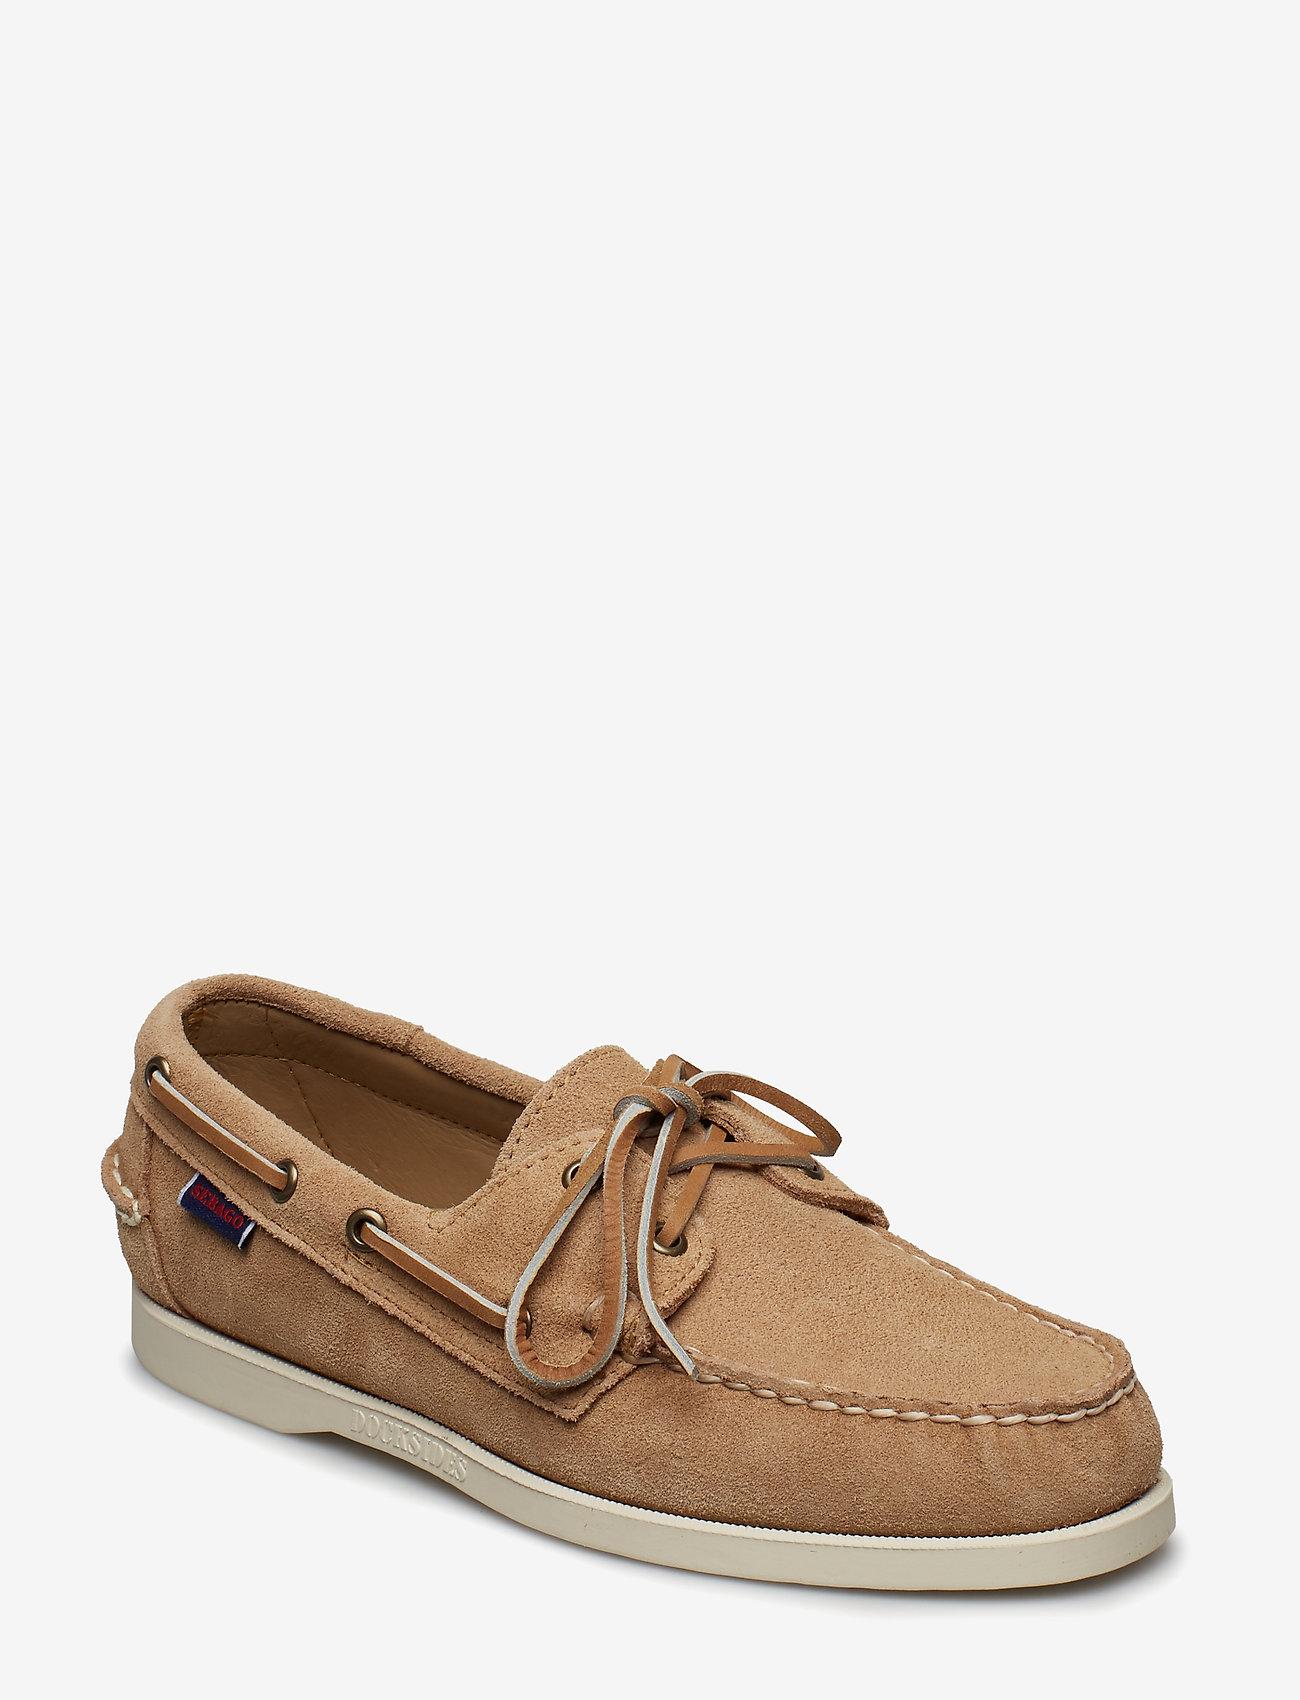 Sebago - Docksides Portland - bootschoenen - beige camel - 0